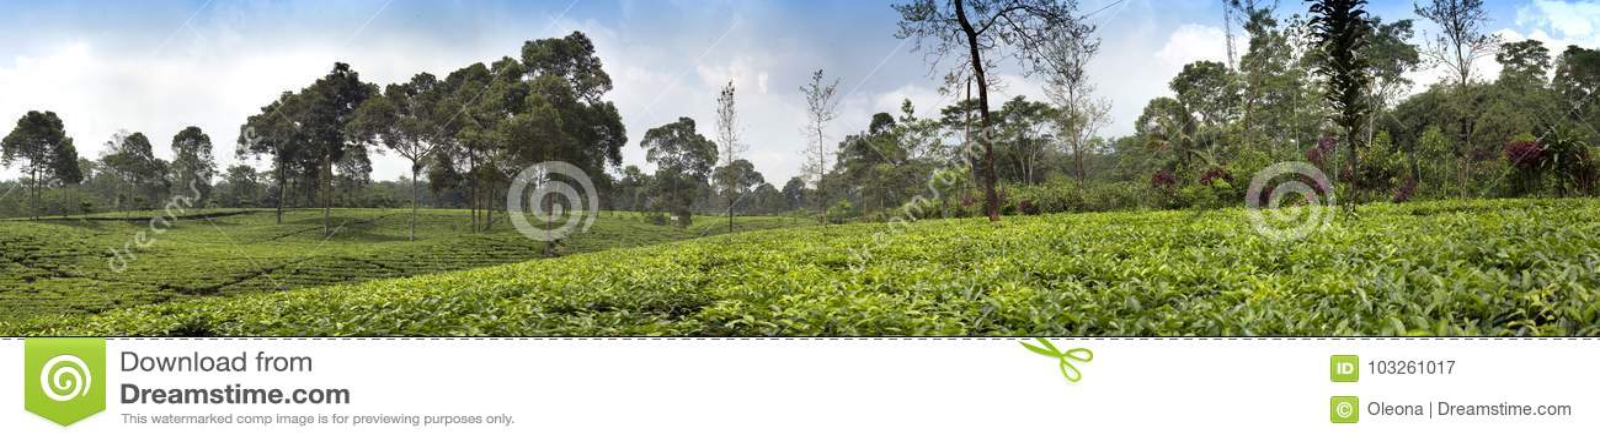 Herbaciana plantacja w Wonosobo borobodur Indonesia Java